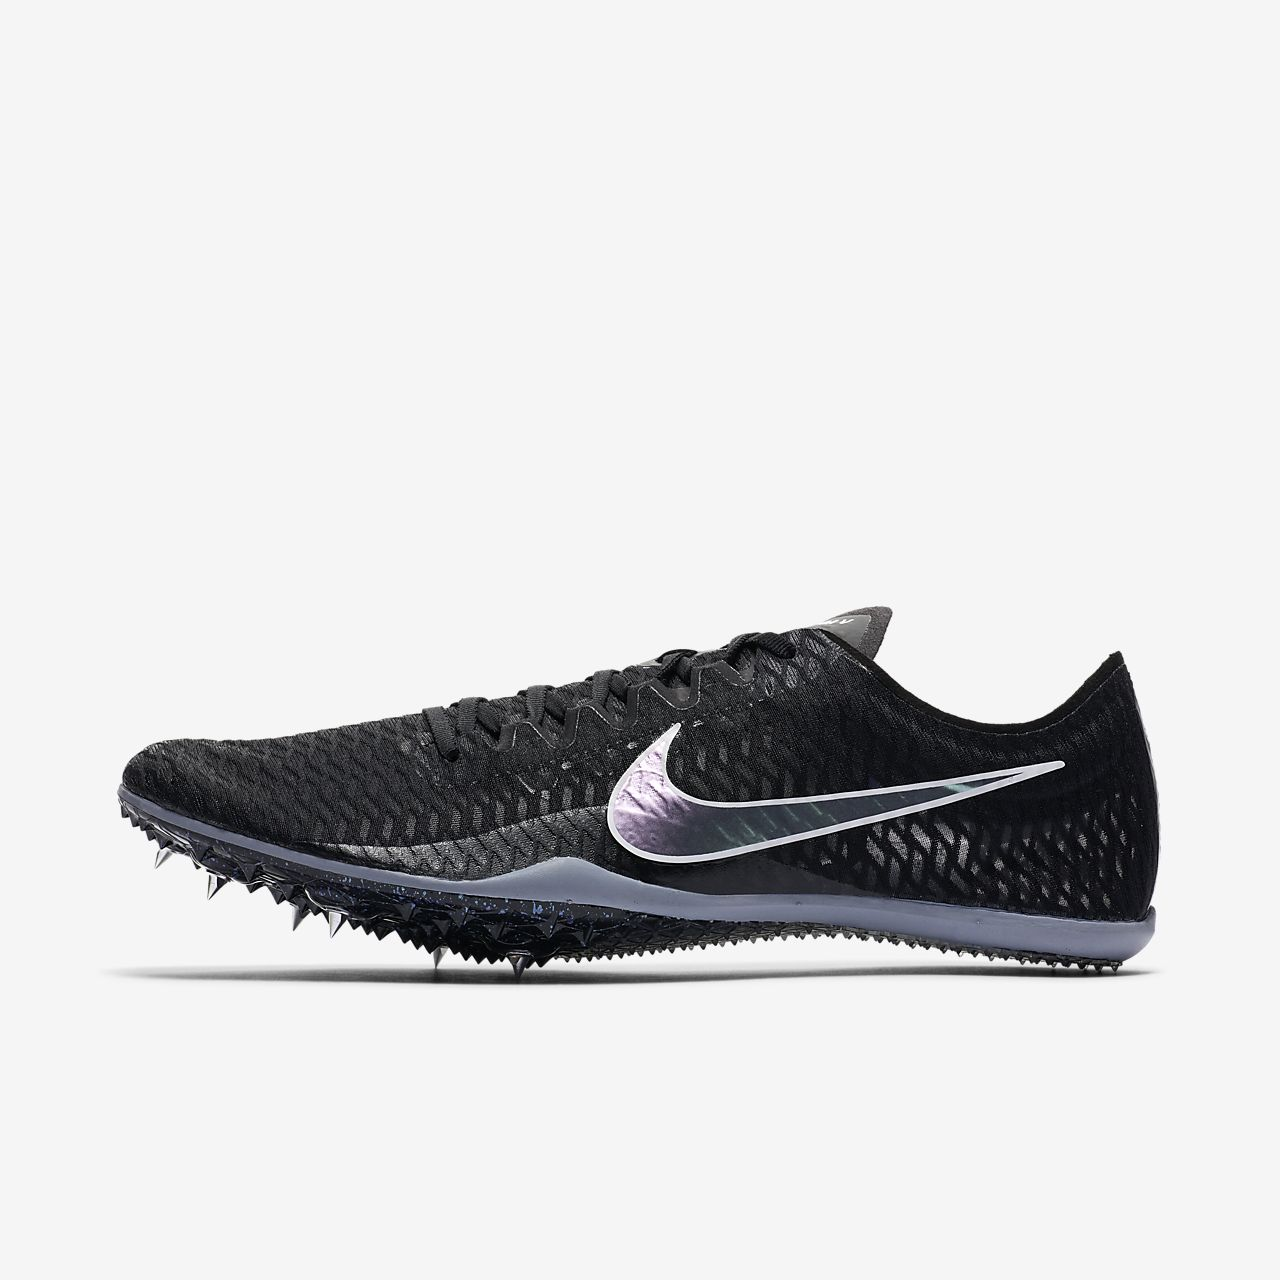 Běžecká bota Nike Zoom Mamba 5